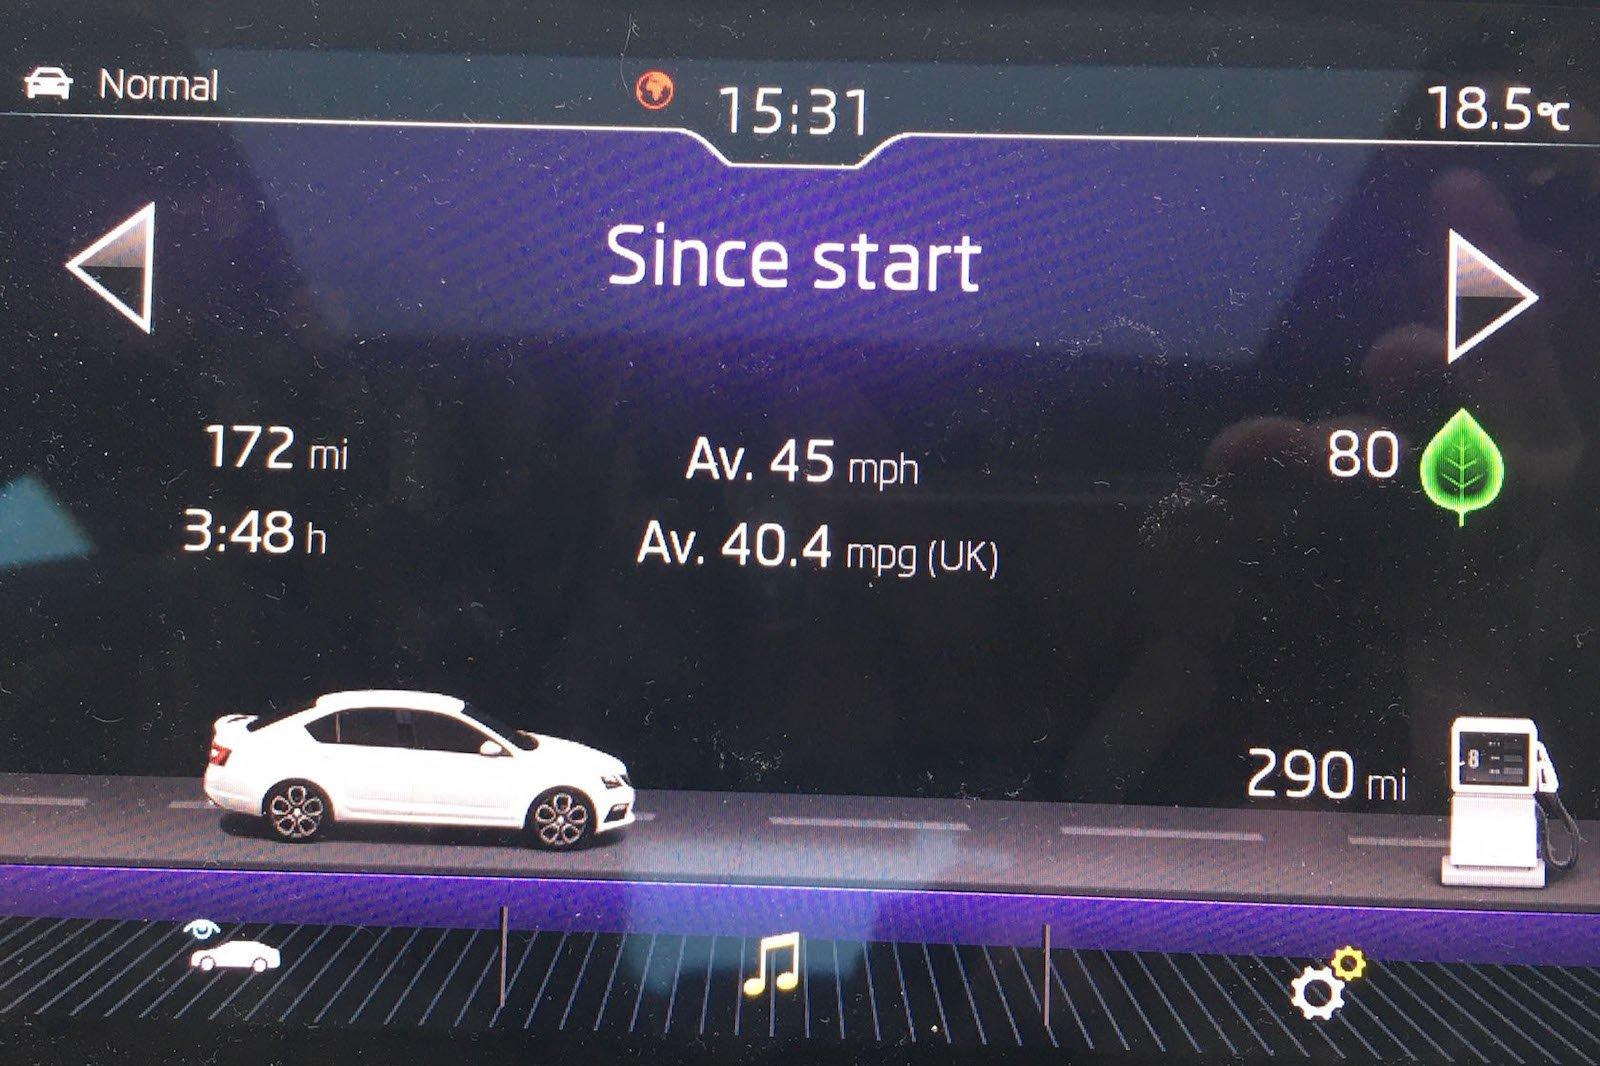 Used Skoda Octavia vRS long-term test review